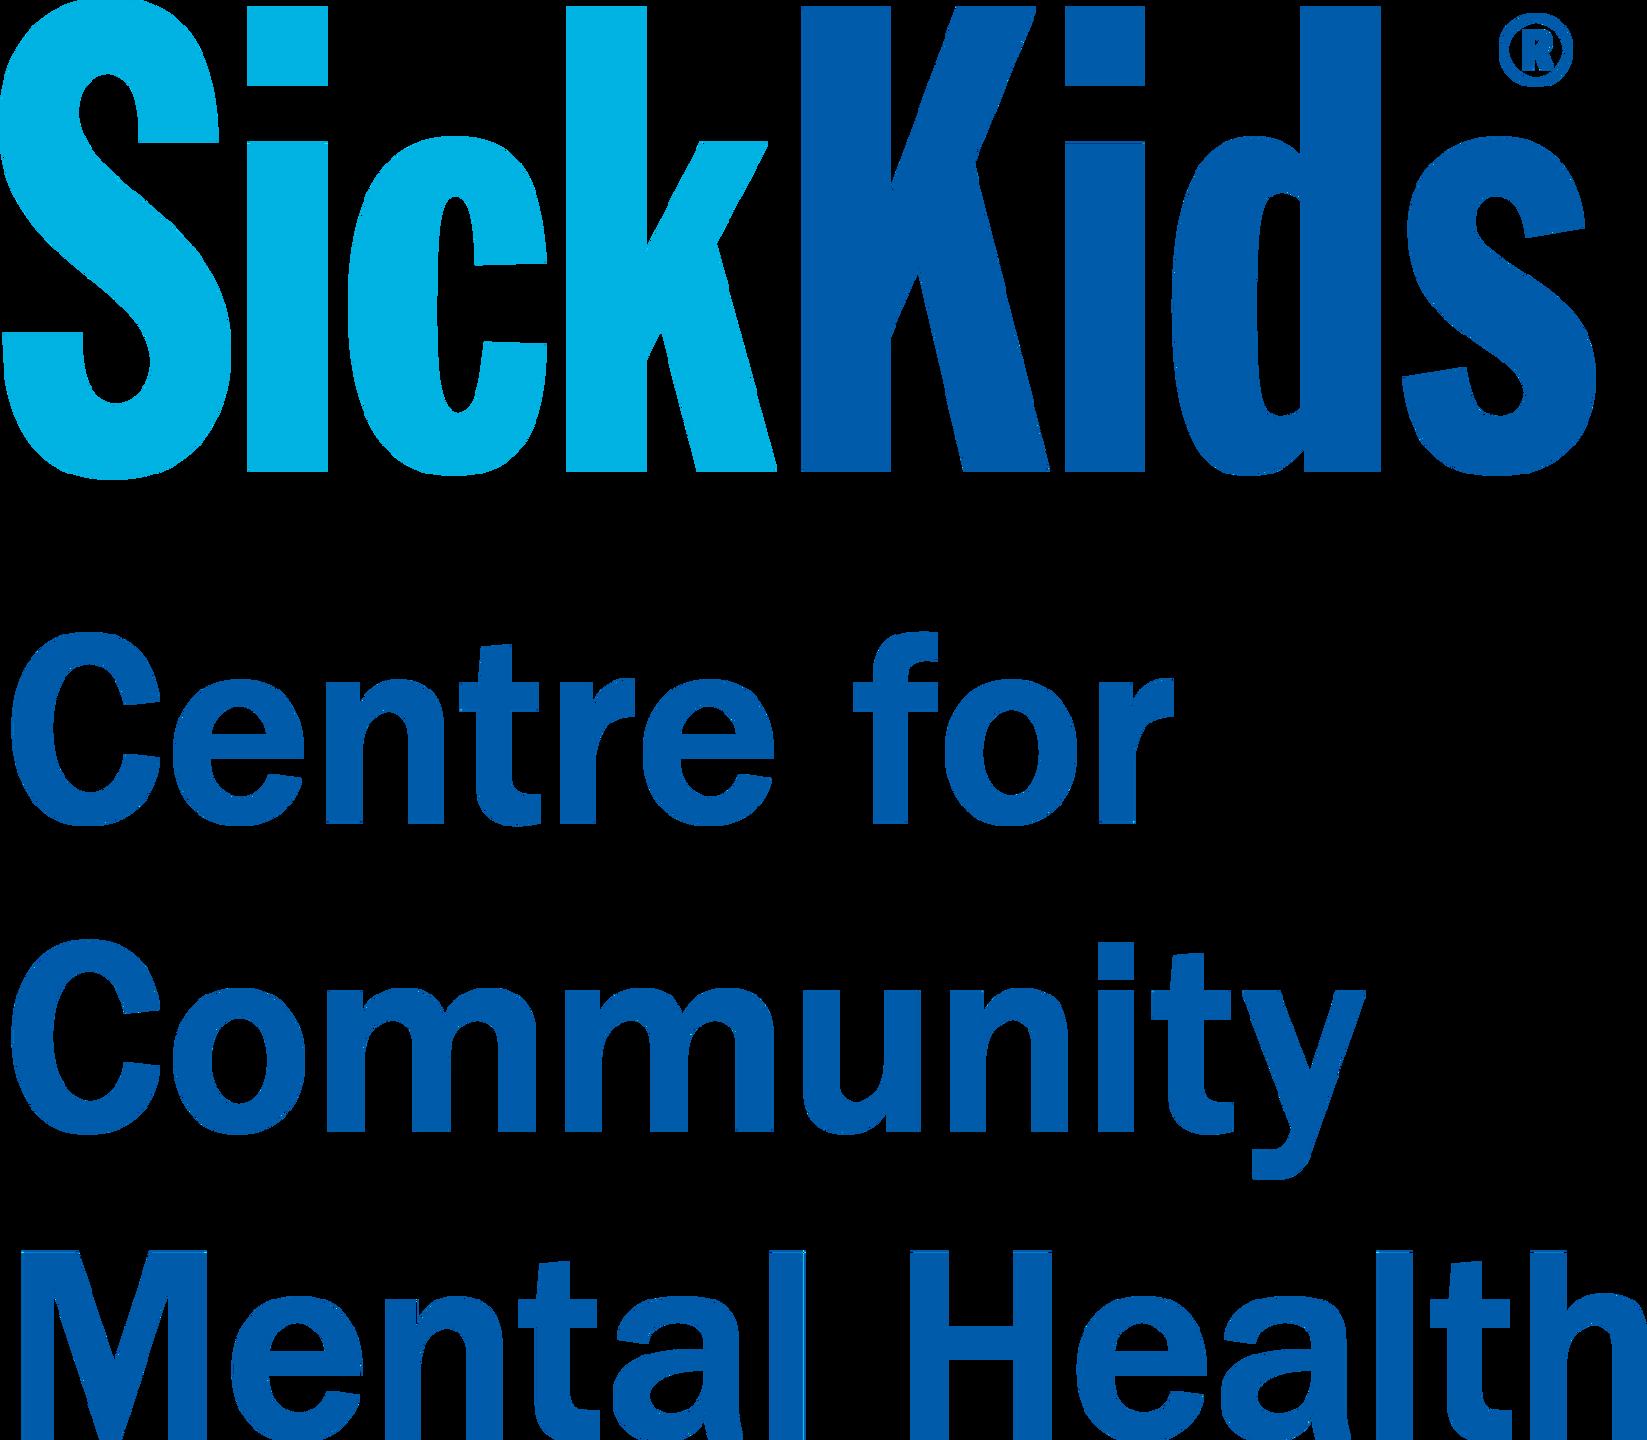 SickKids Centre for Community Mental Health